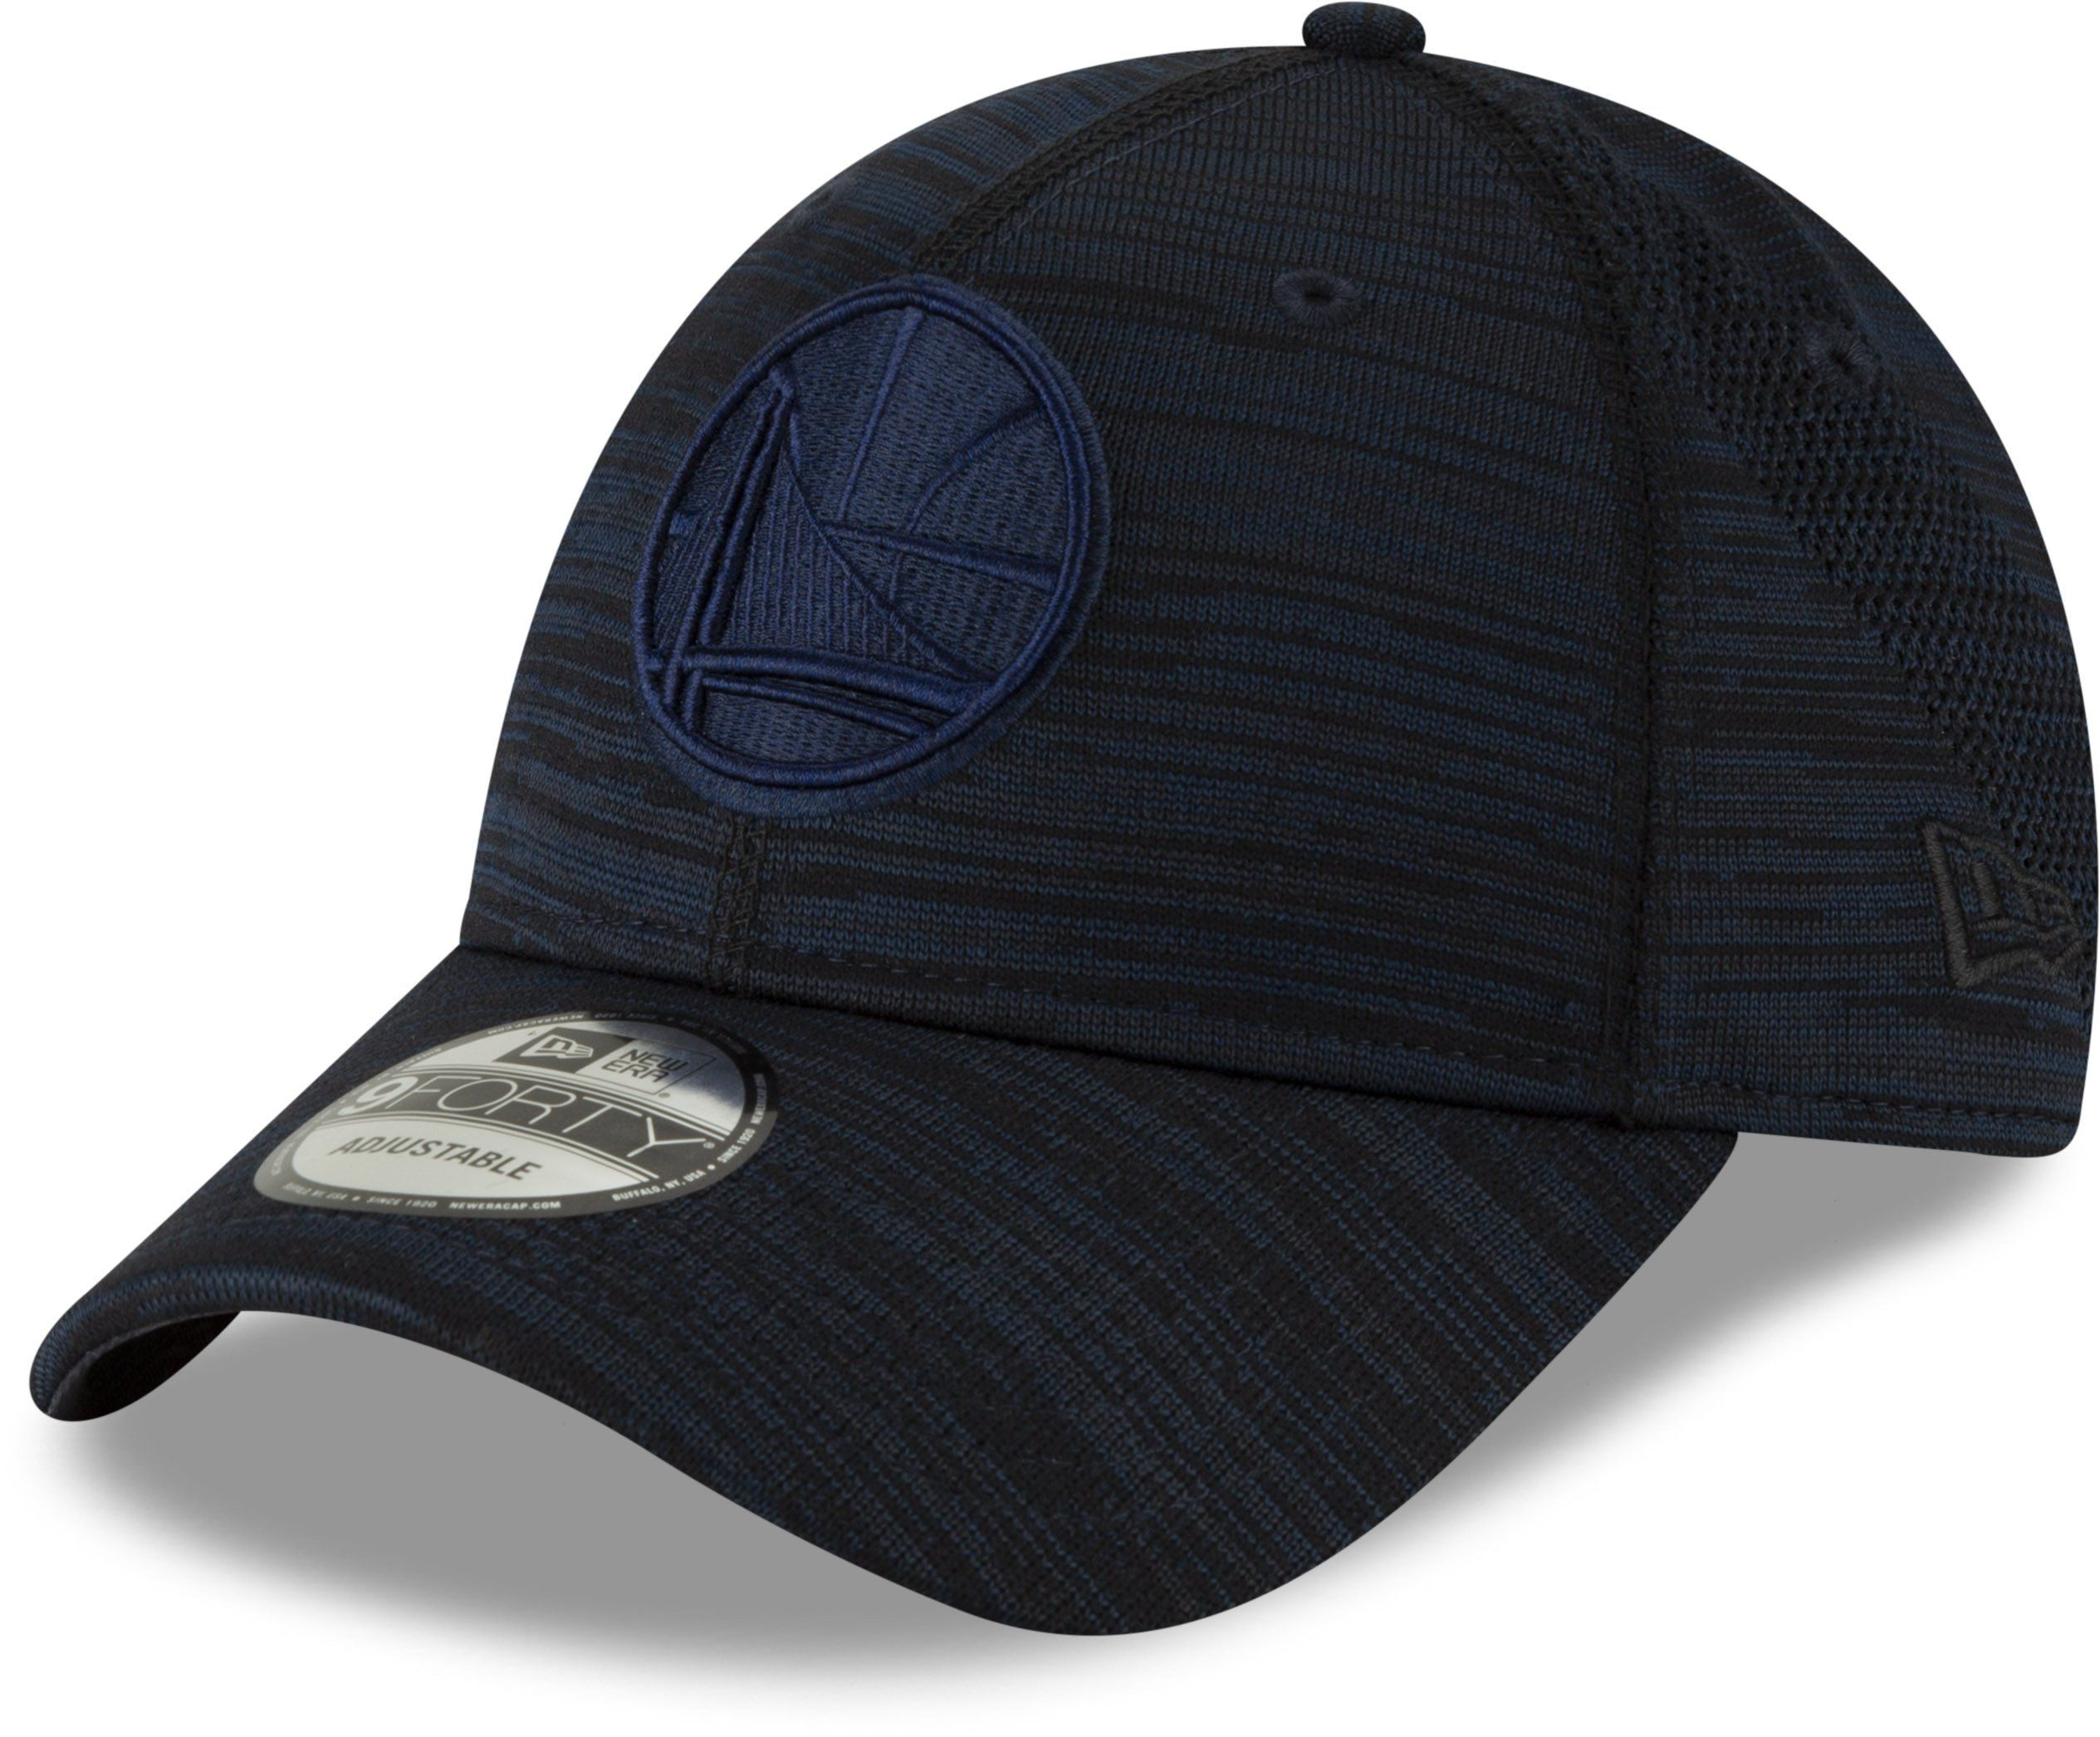 c57870a16 Golden State Warriors New Era 940 Engineered Fit Cap | NBA Teams ...